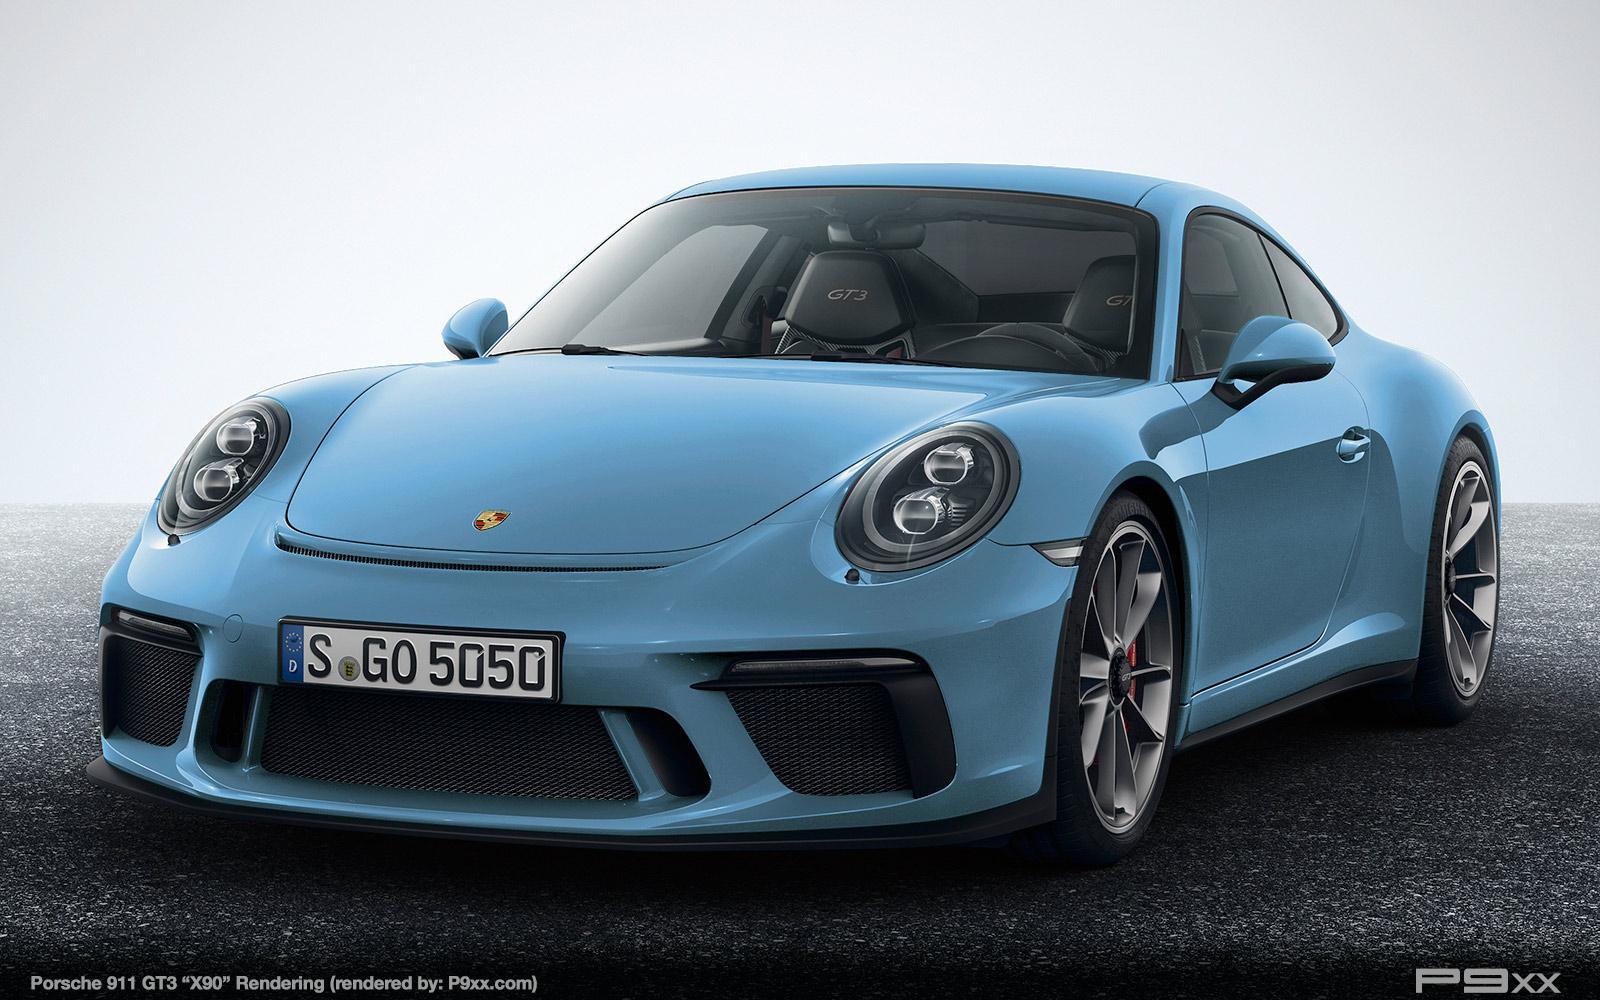 Race Kart 42048 besides 1992 Porsche 964 Carrera Rs M001 further Porsche356Acabriolet furthermore 2663 1965 ford fairlane 500 likewise Then Vs Now 1967 Porsche 911 Targa 2016 Targa4s. on porsche transmission